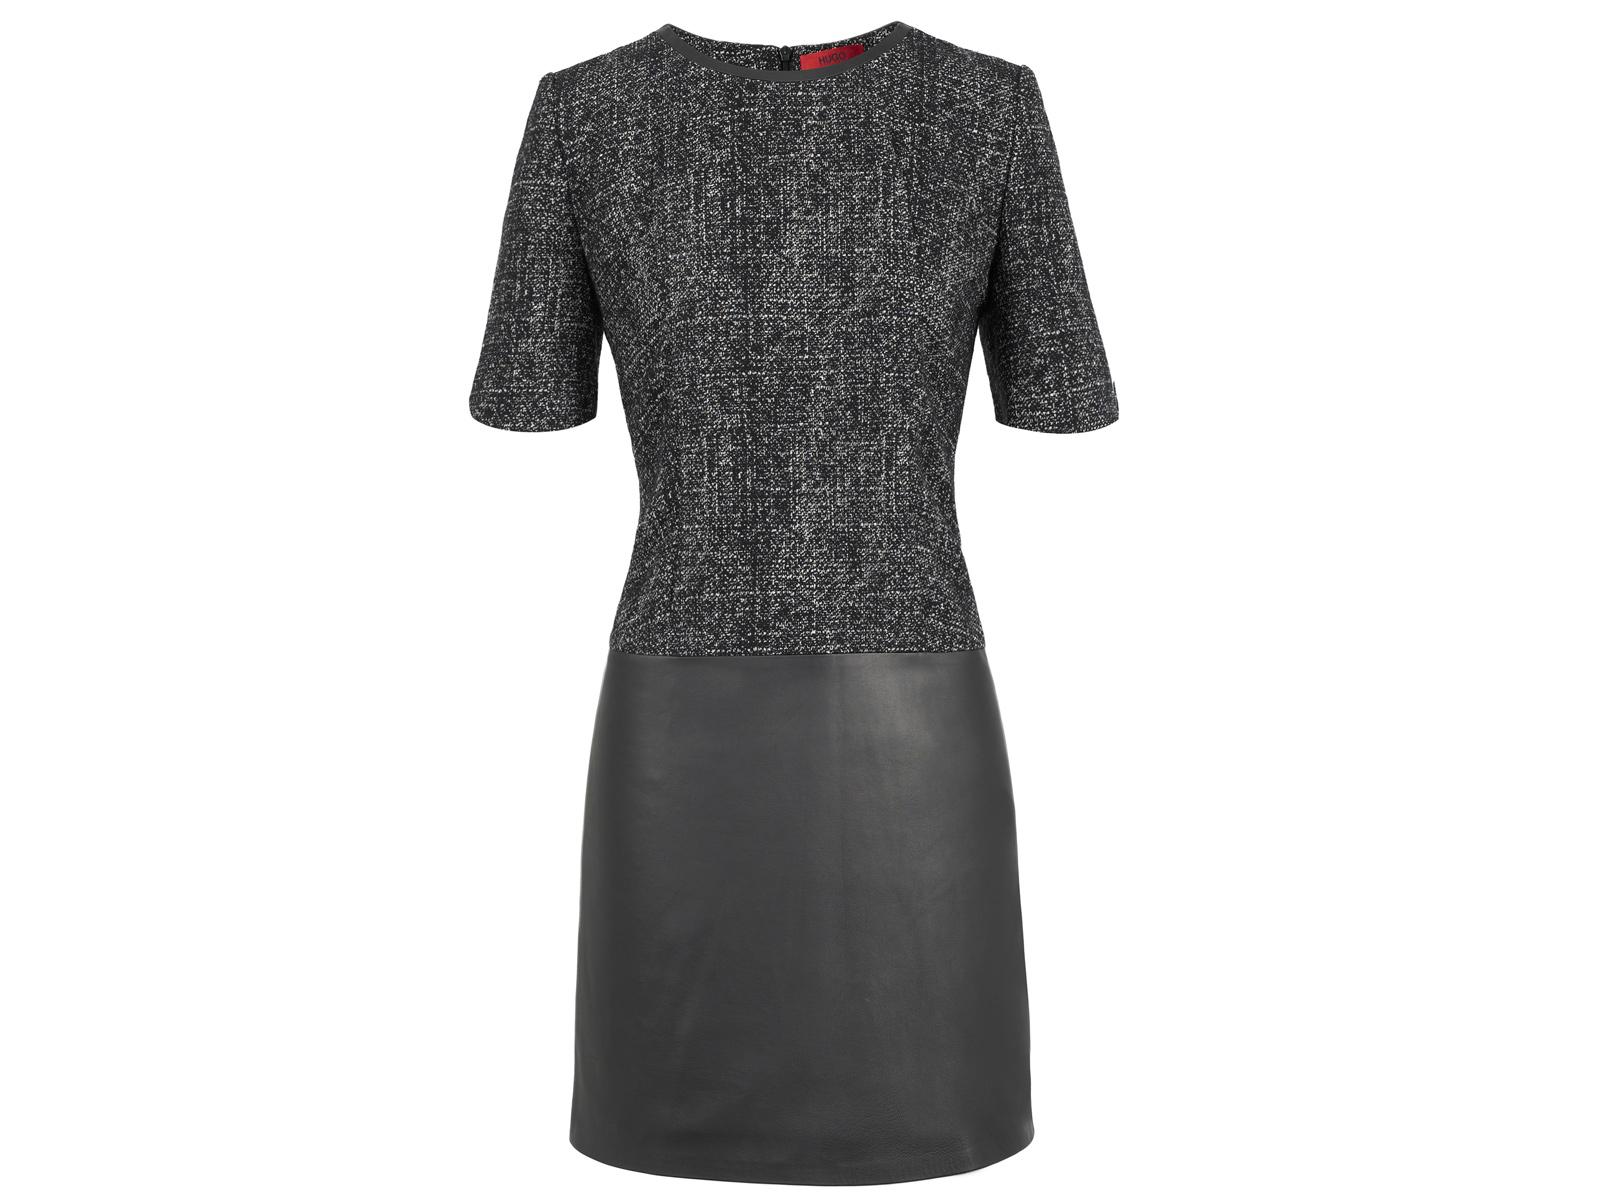 Платье, Hugo ЦУМ, ул. Петровка, 2,  тел.(495) 933 7300 цена 27 200 руб.